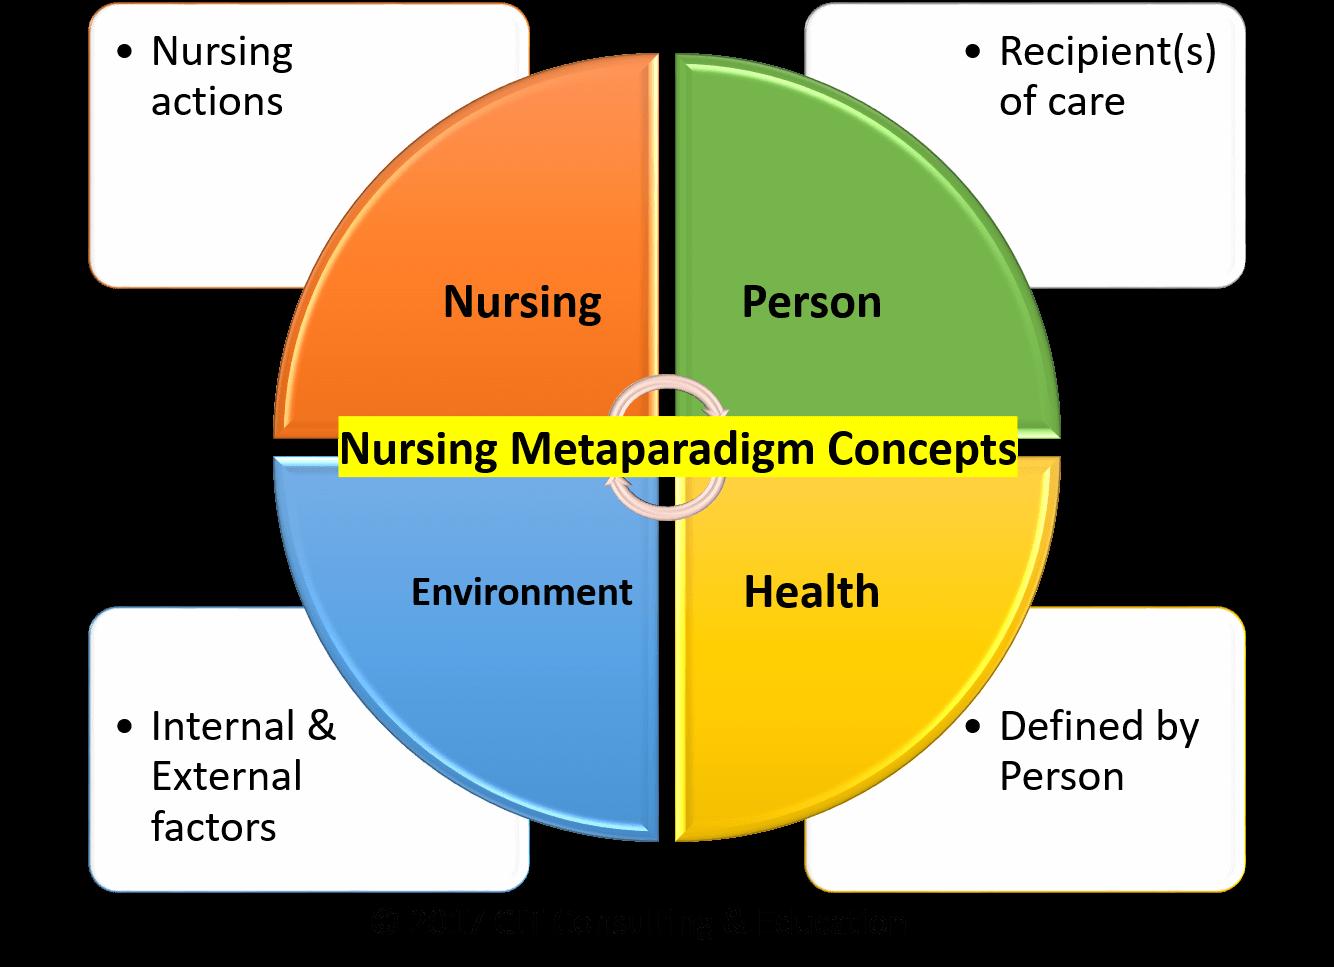 Orem Nursing Action Diagram - Information Schematics Wiring Diagrams